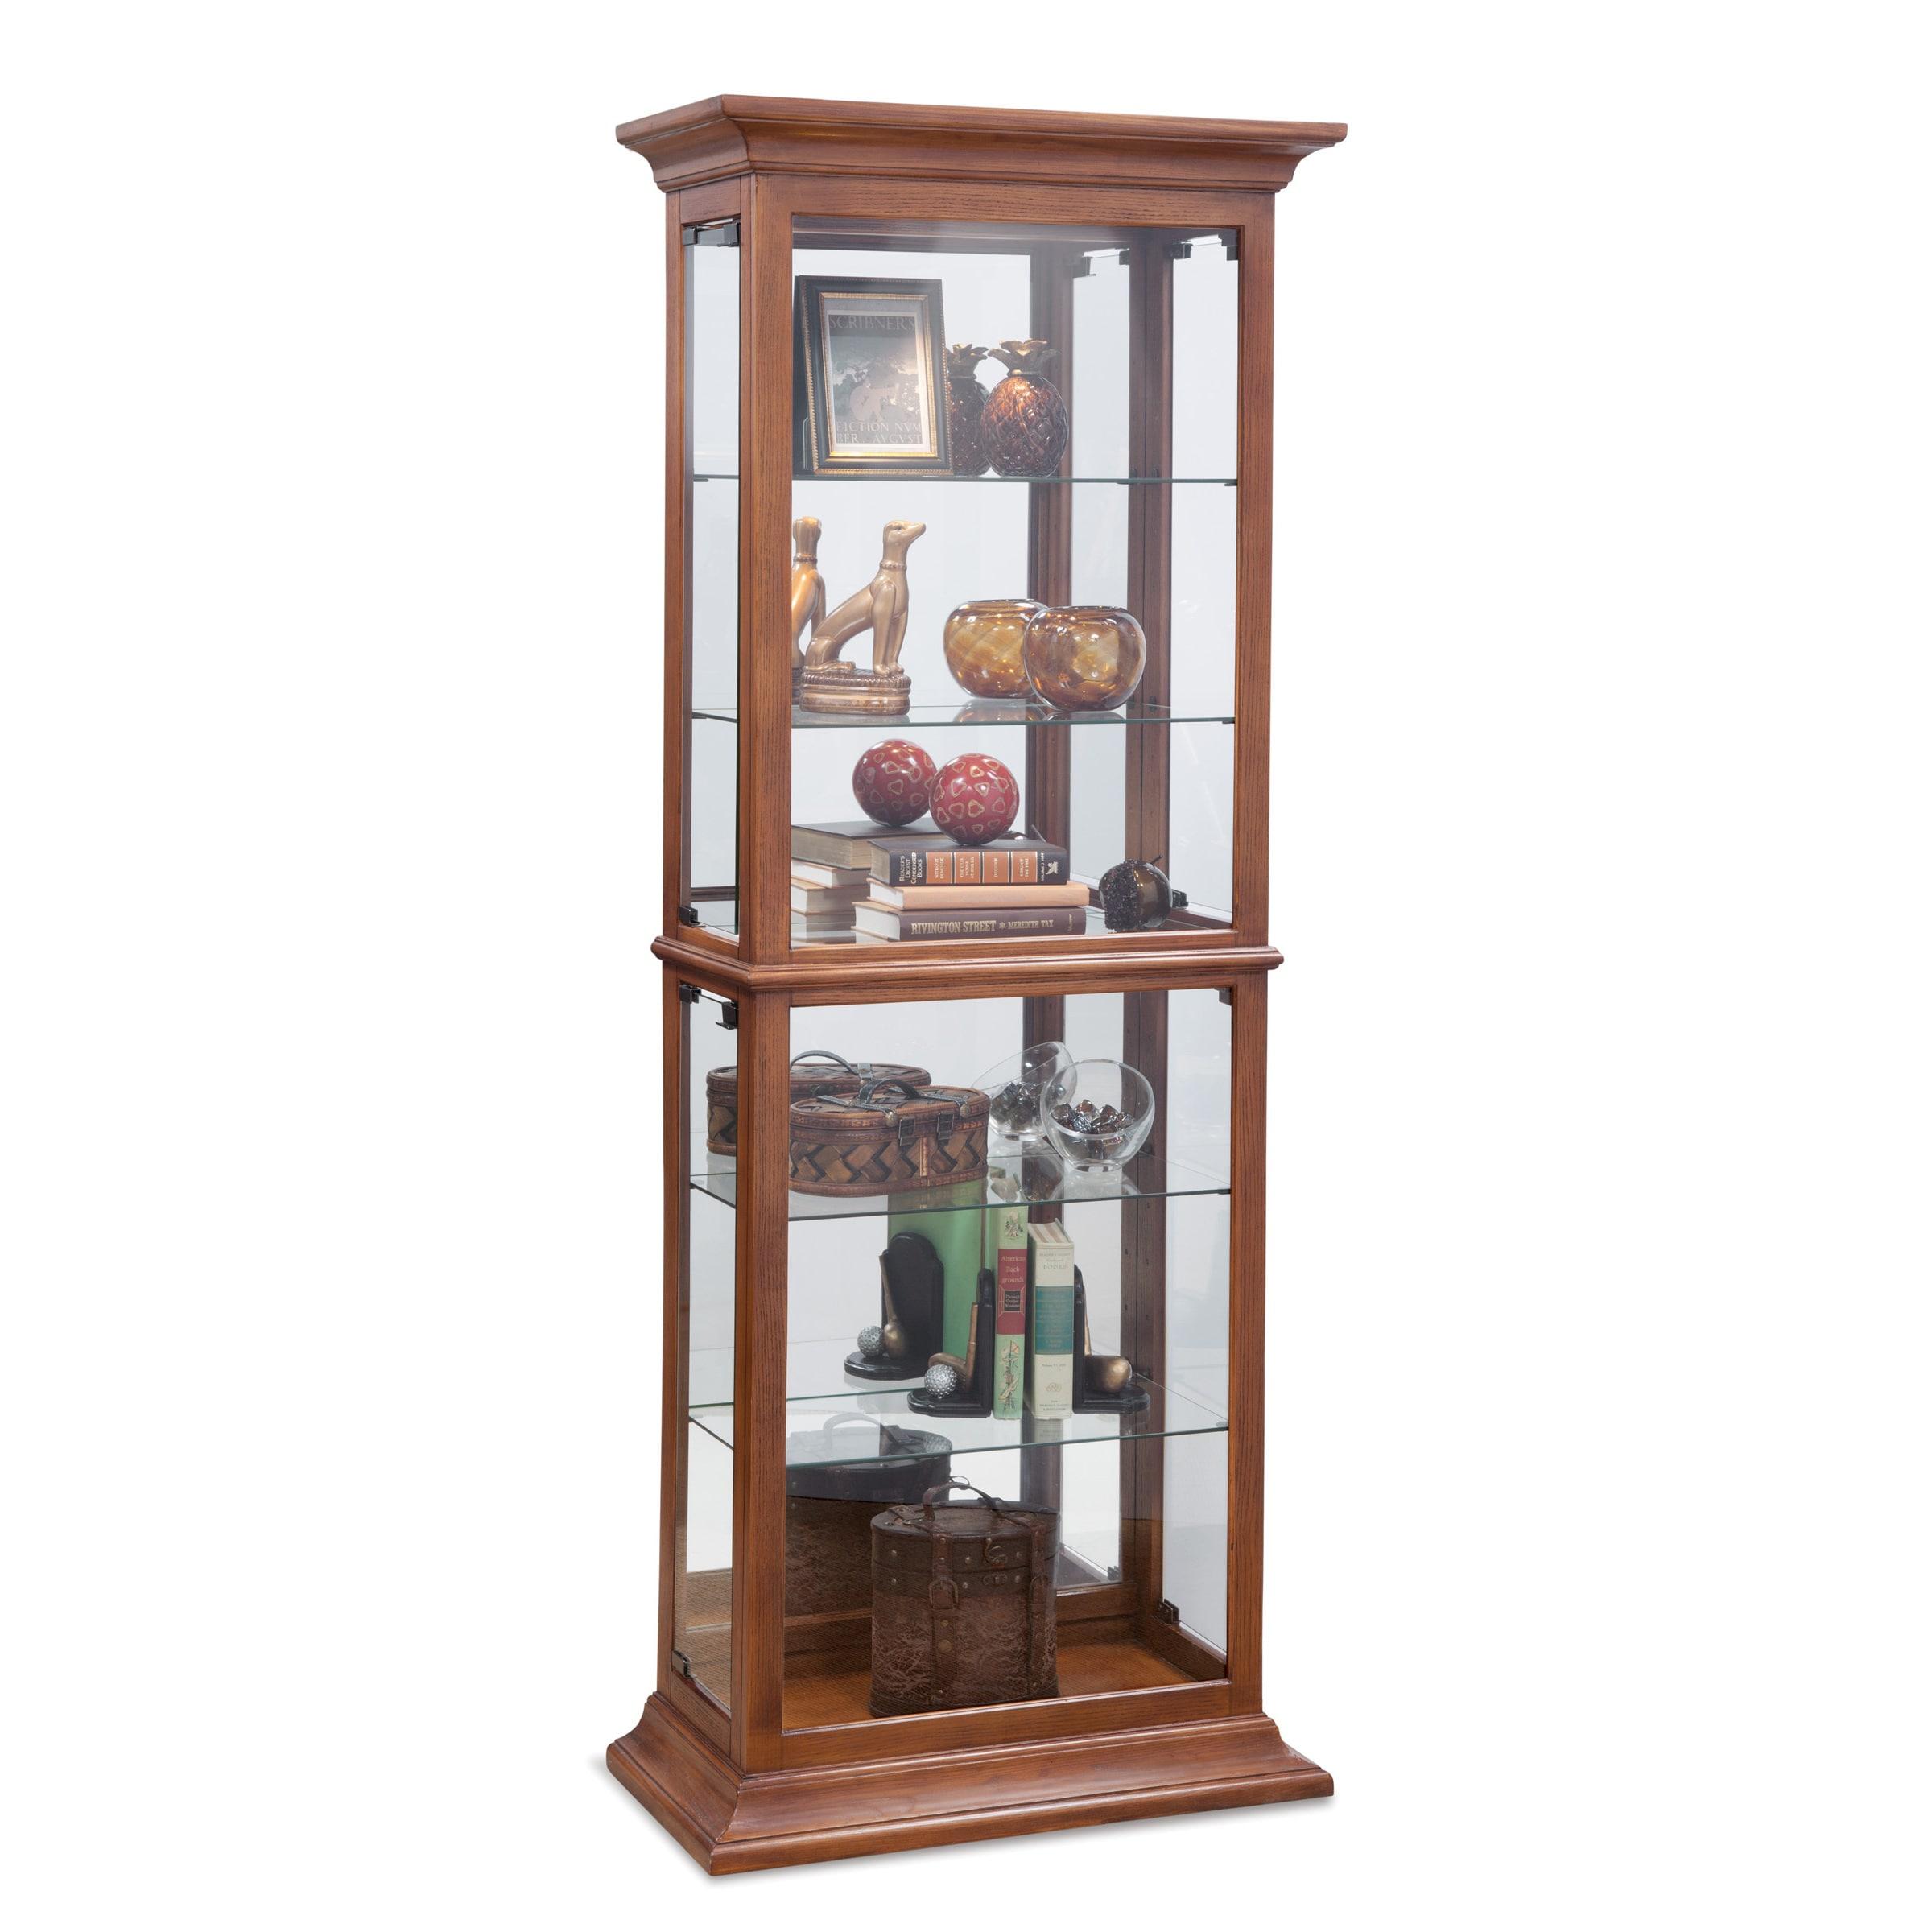 Philip Reinisch Fairfield I Oak Wood and Glass Curio Cabi...